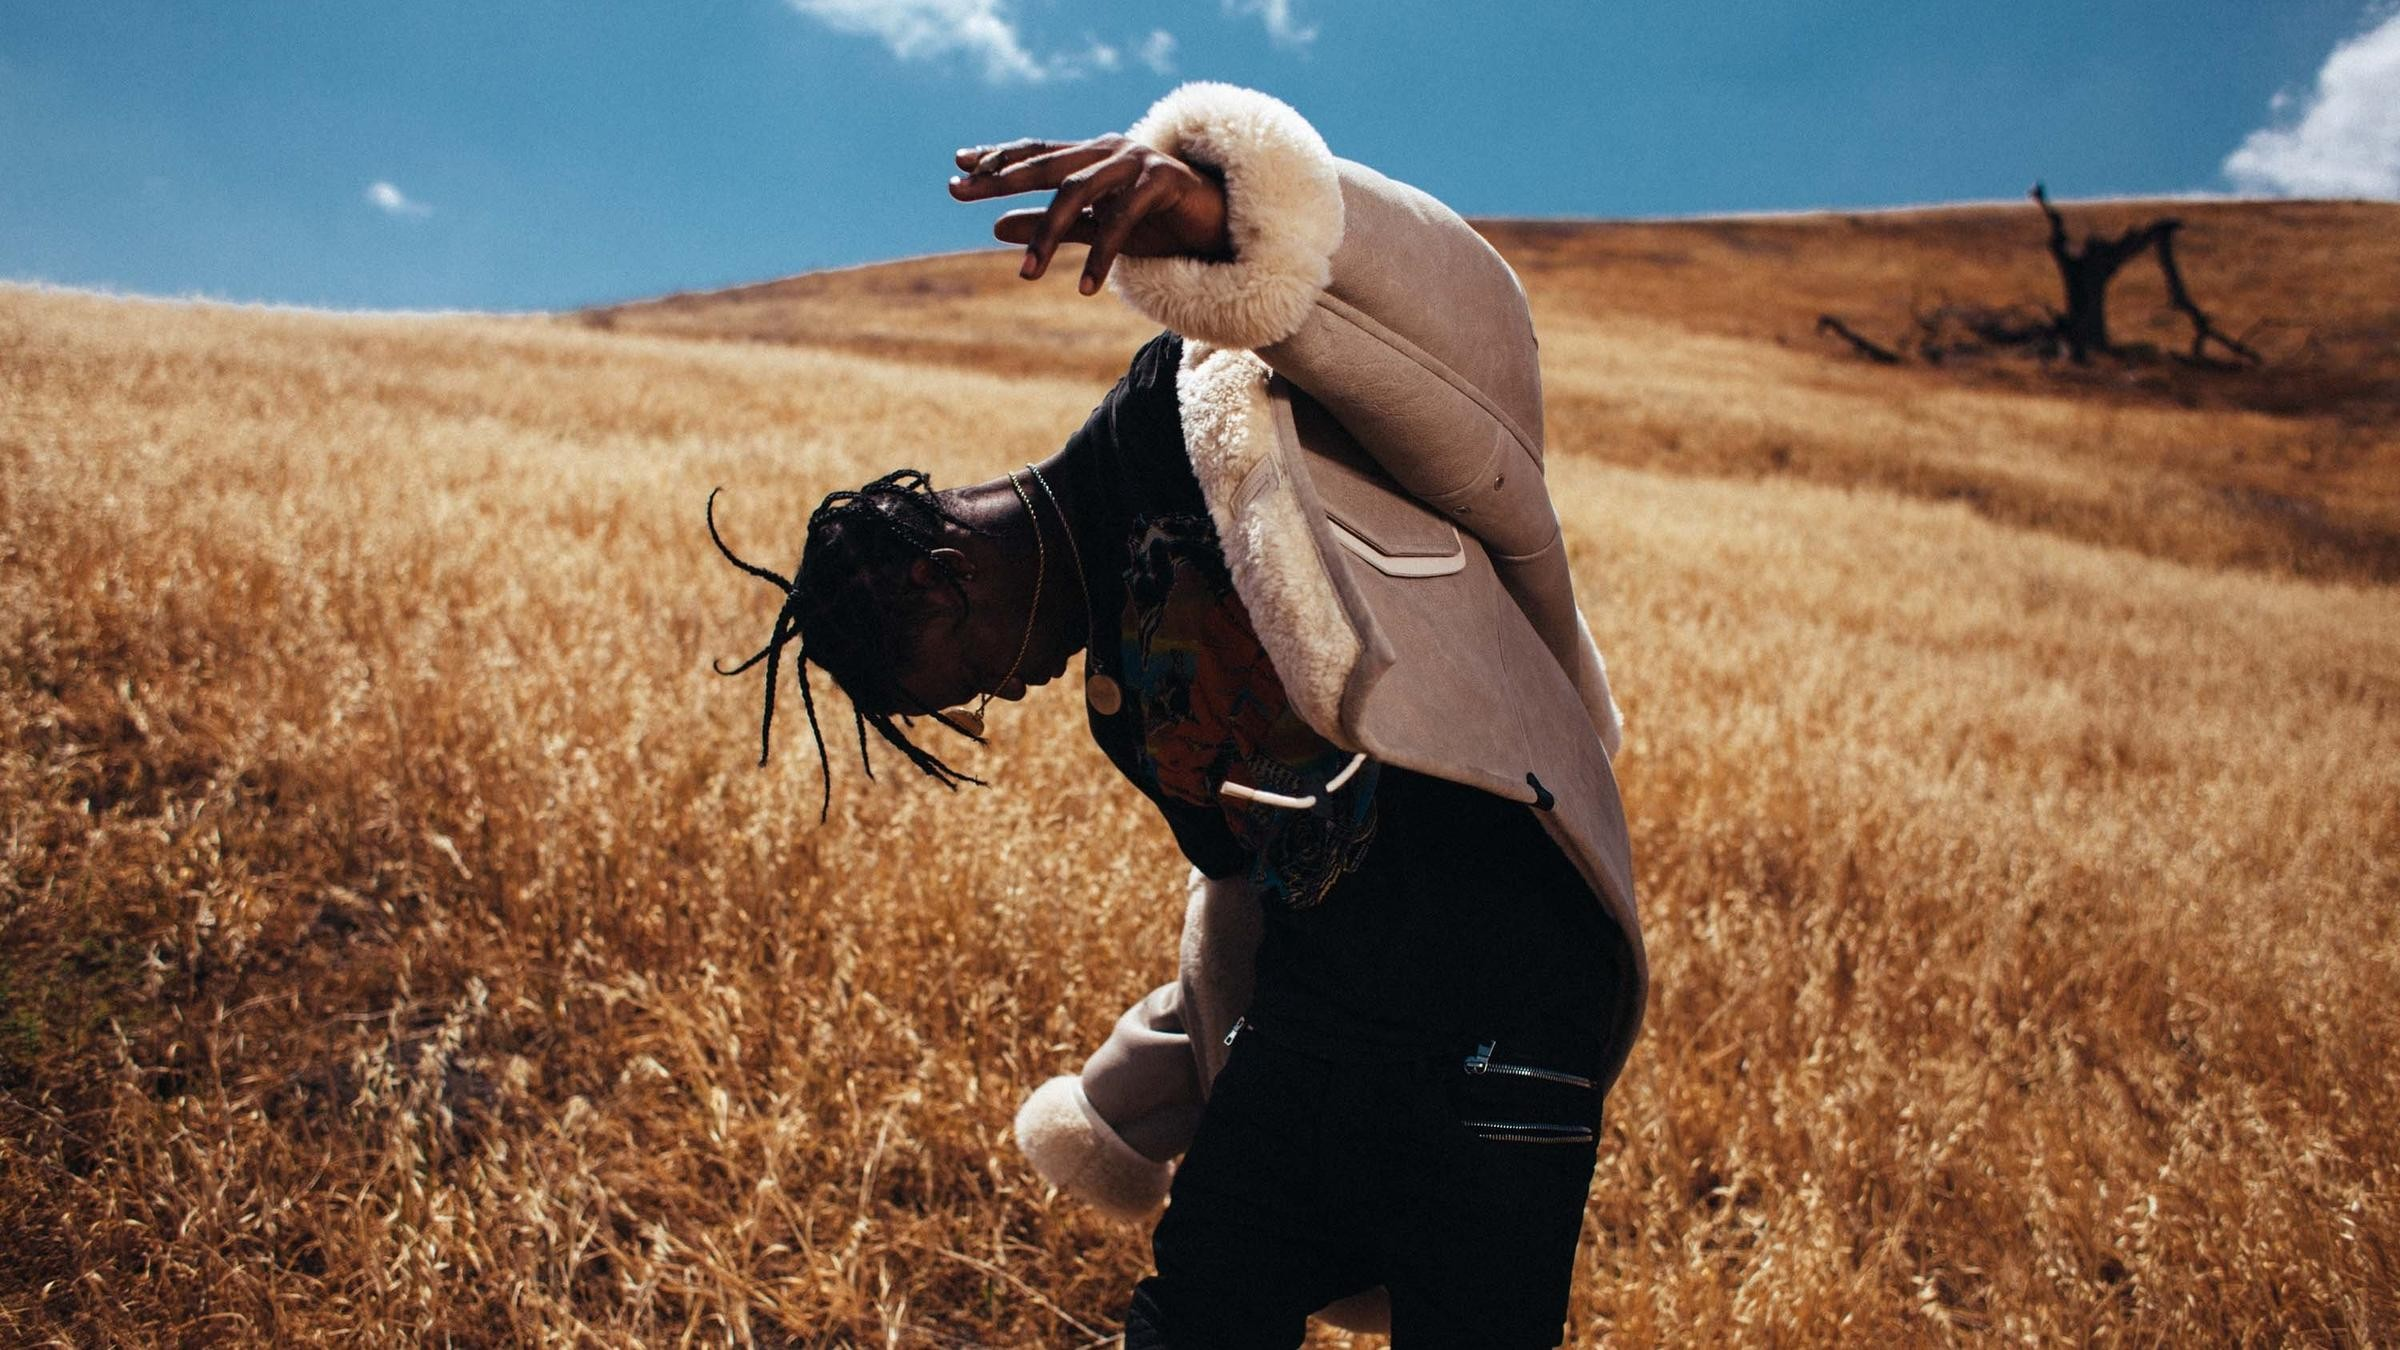 Kanye West Iphone Wallpaper Travis Scott Wallpaper 183 ① Download Free Amazing Hd